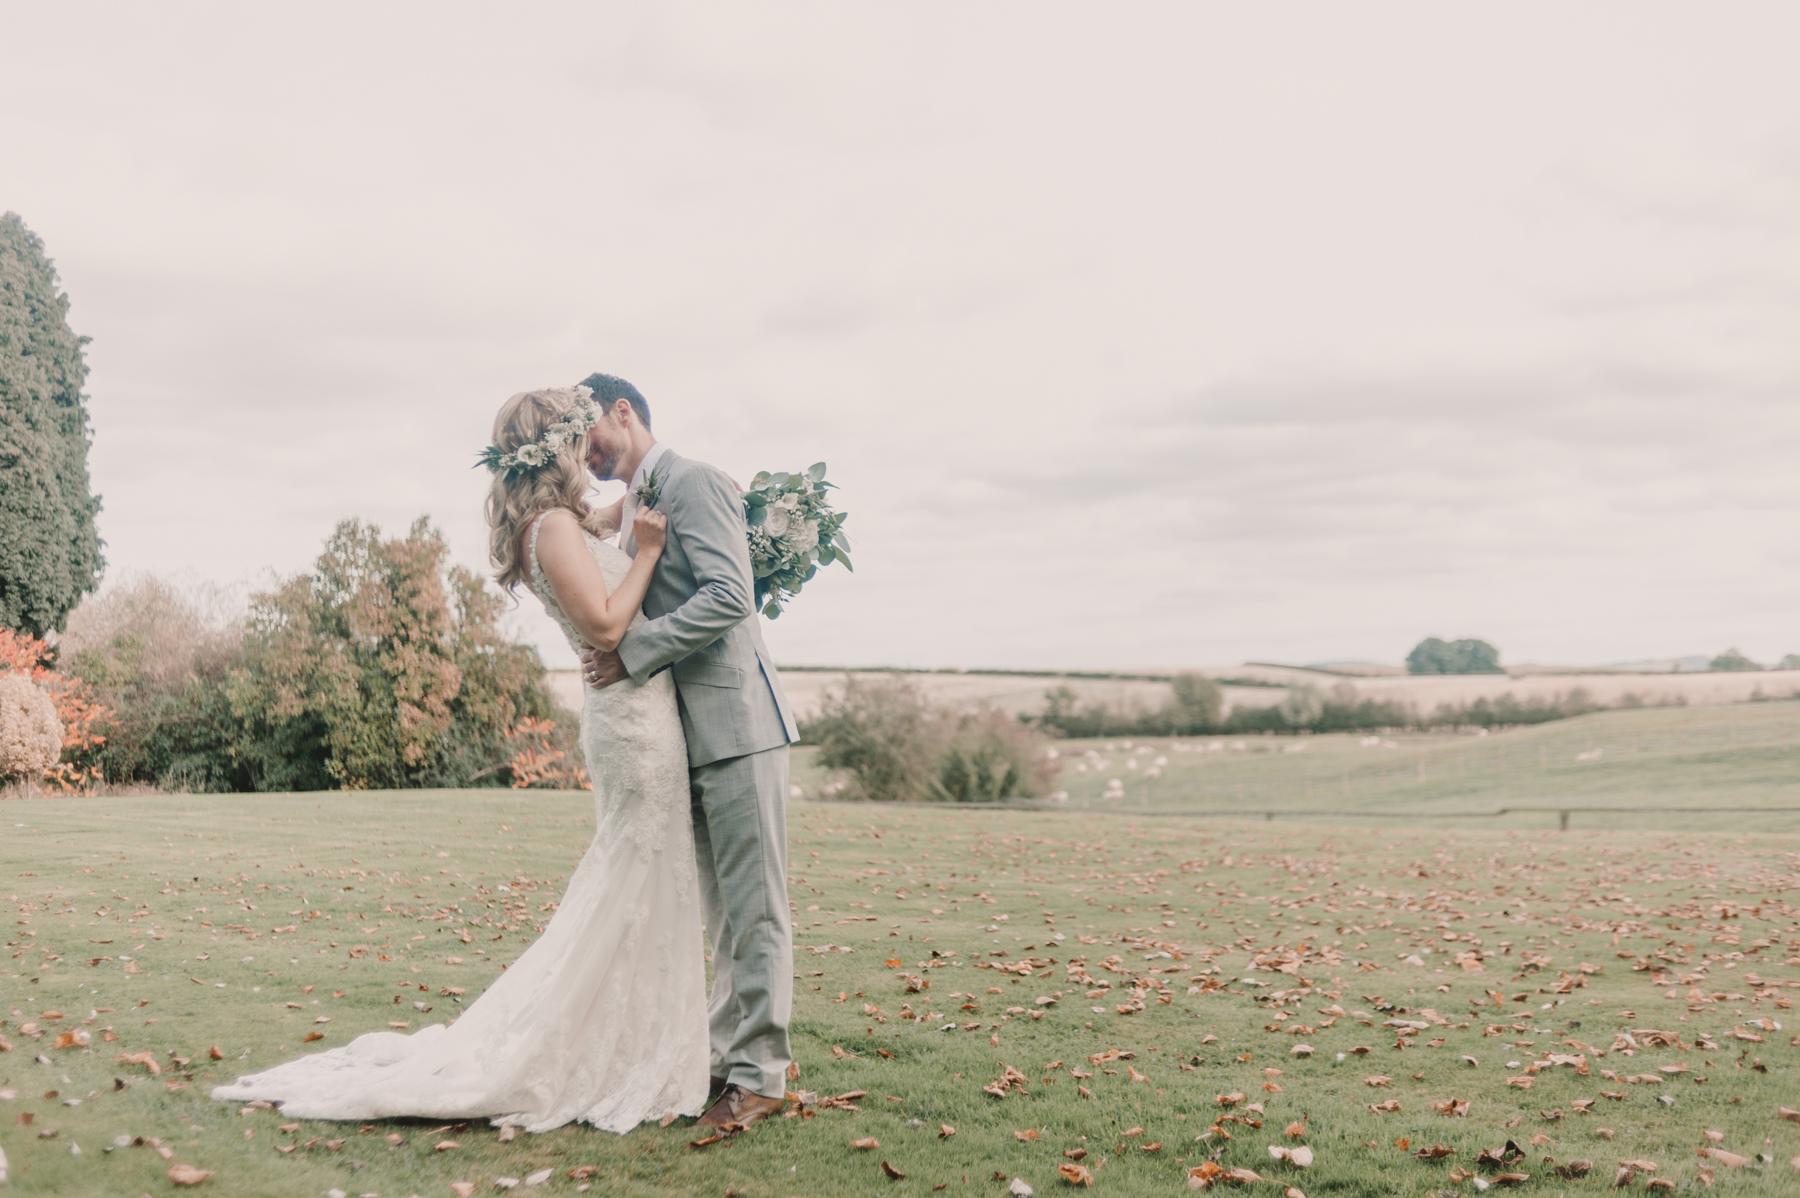 Herefordshire-barn-wedding-highlights-081.jpg